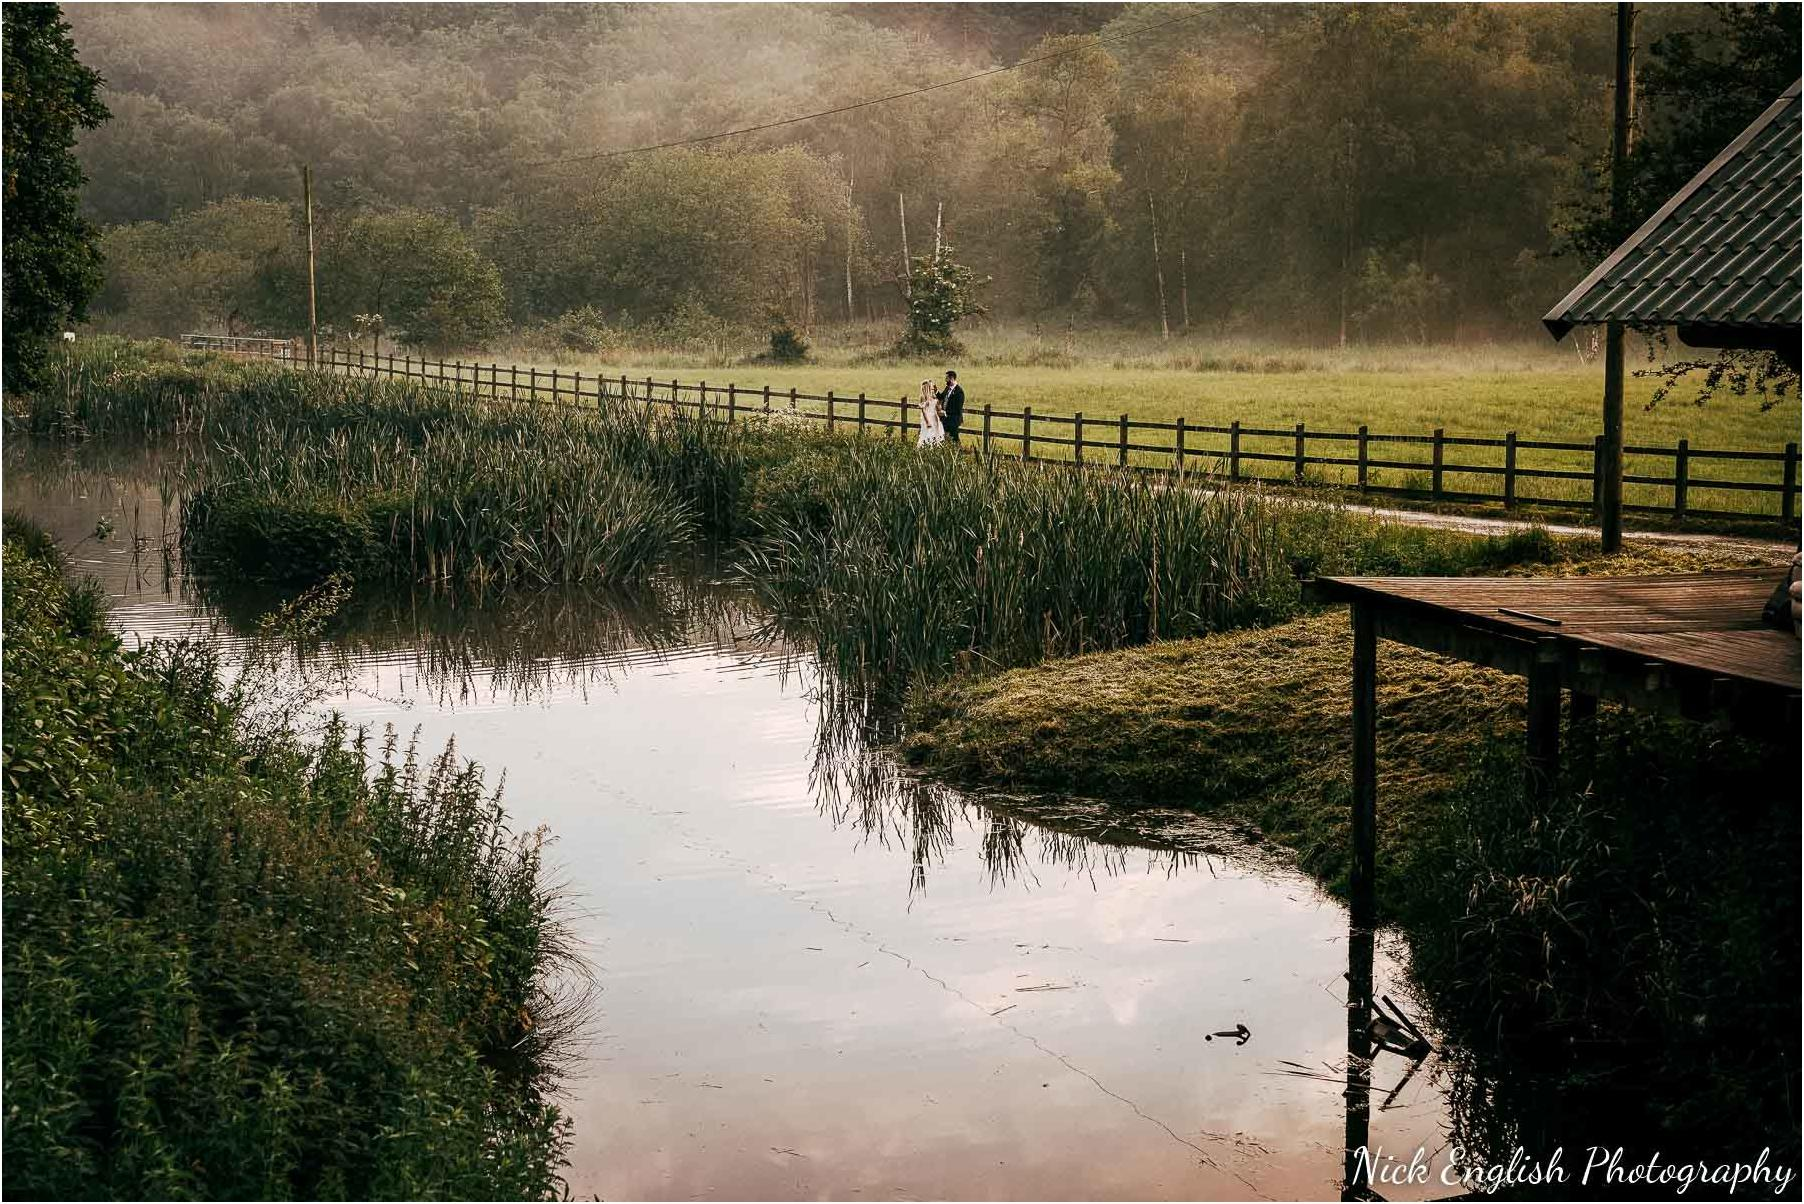 Whitebottom_Farm_Wedding_Manchester_Photograph-141.jpg